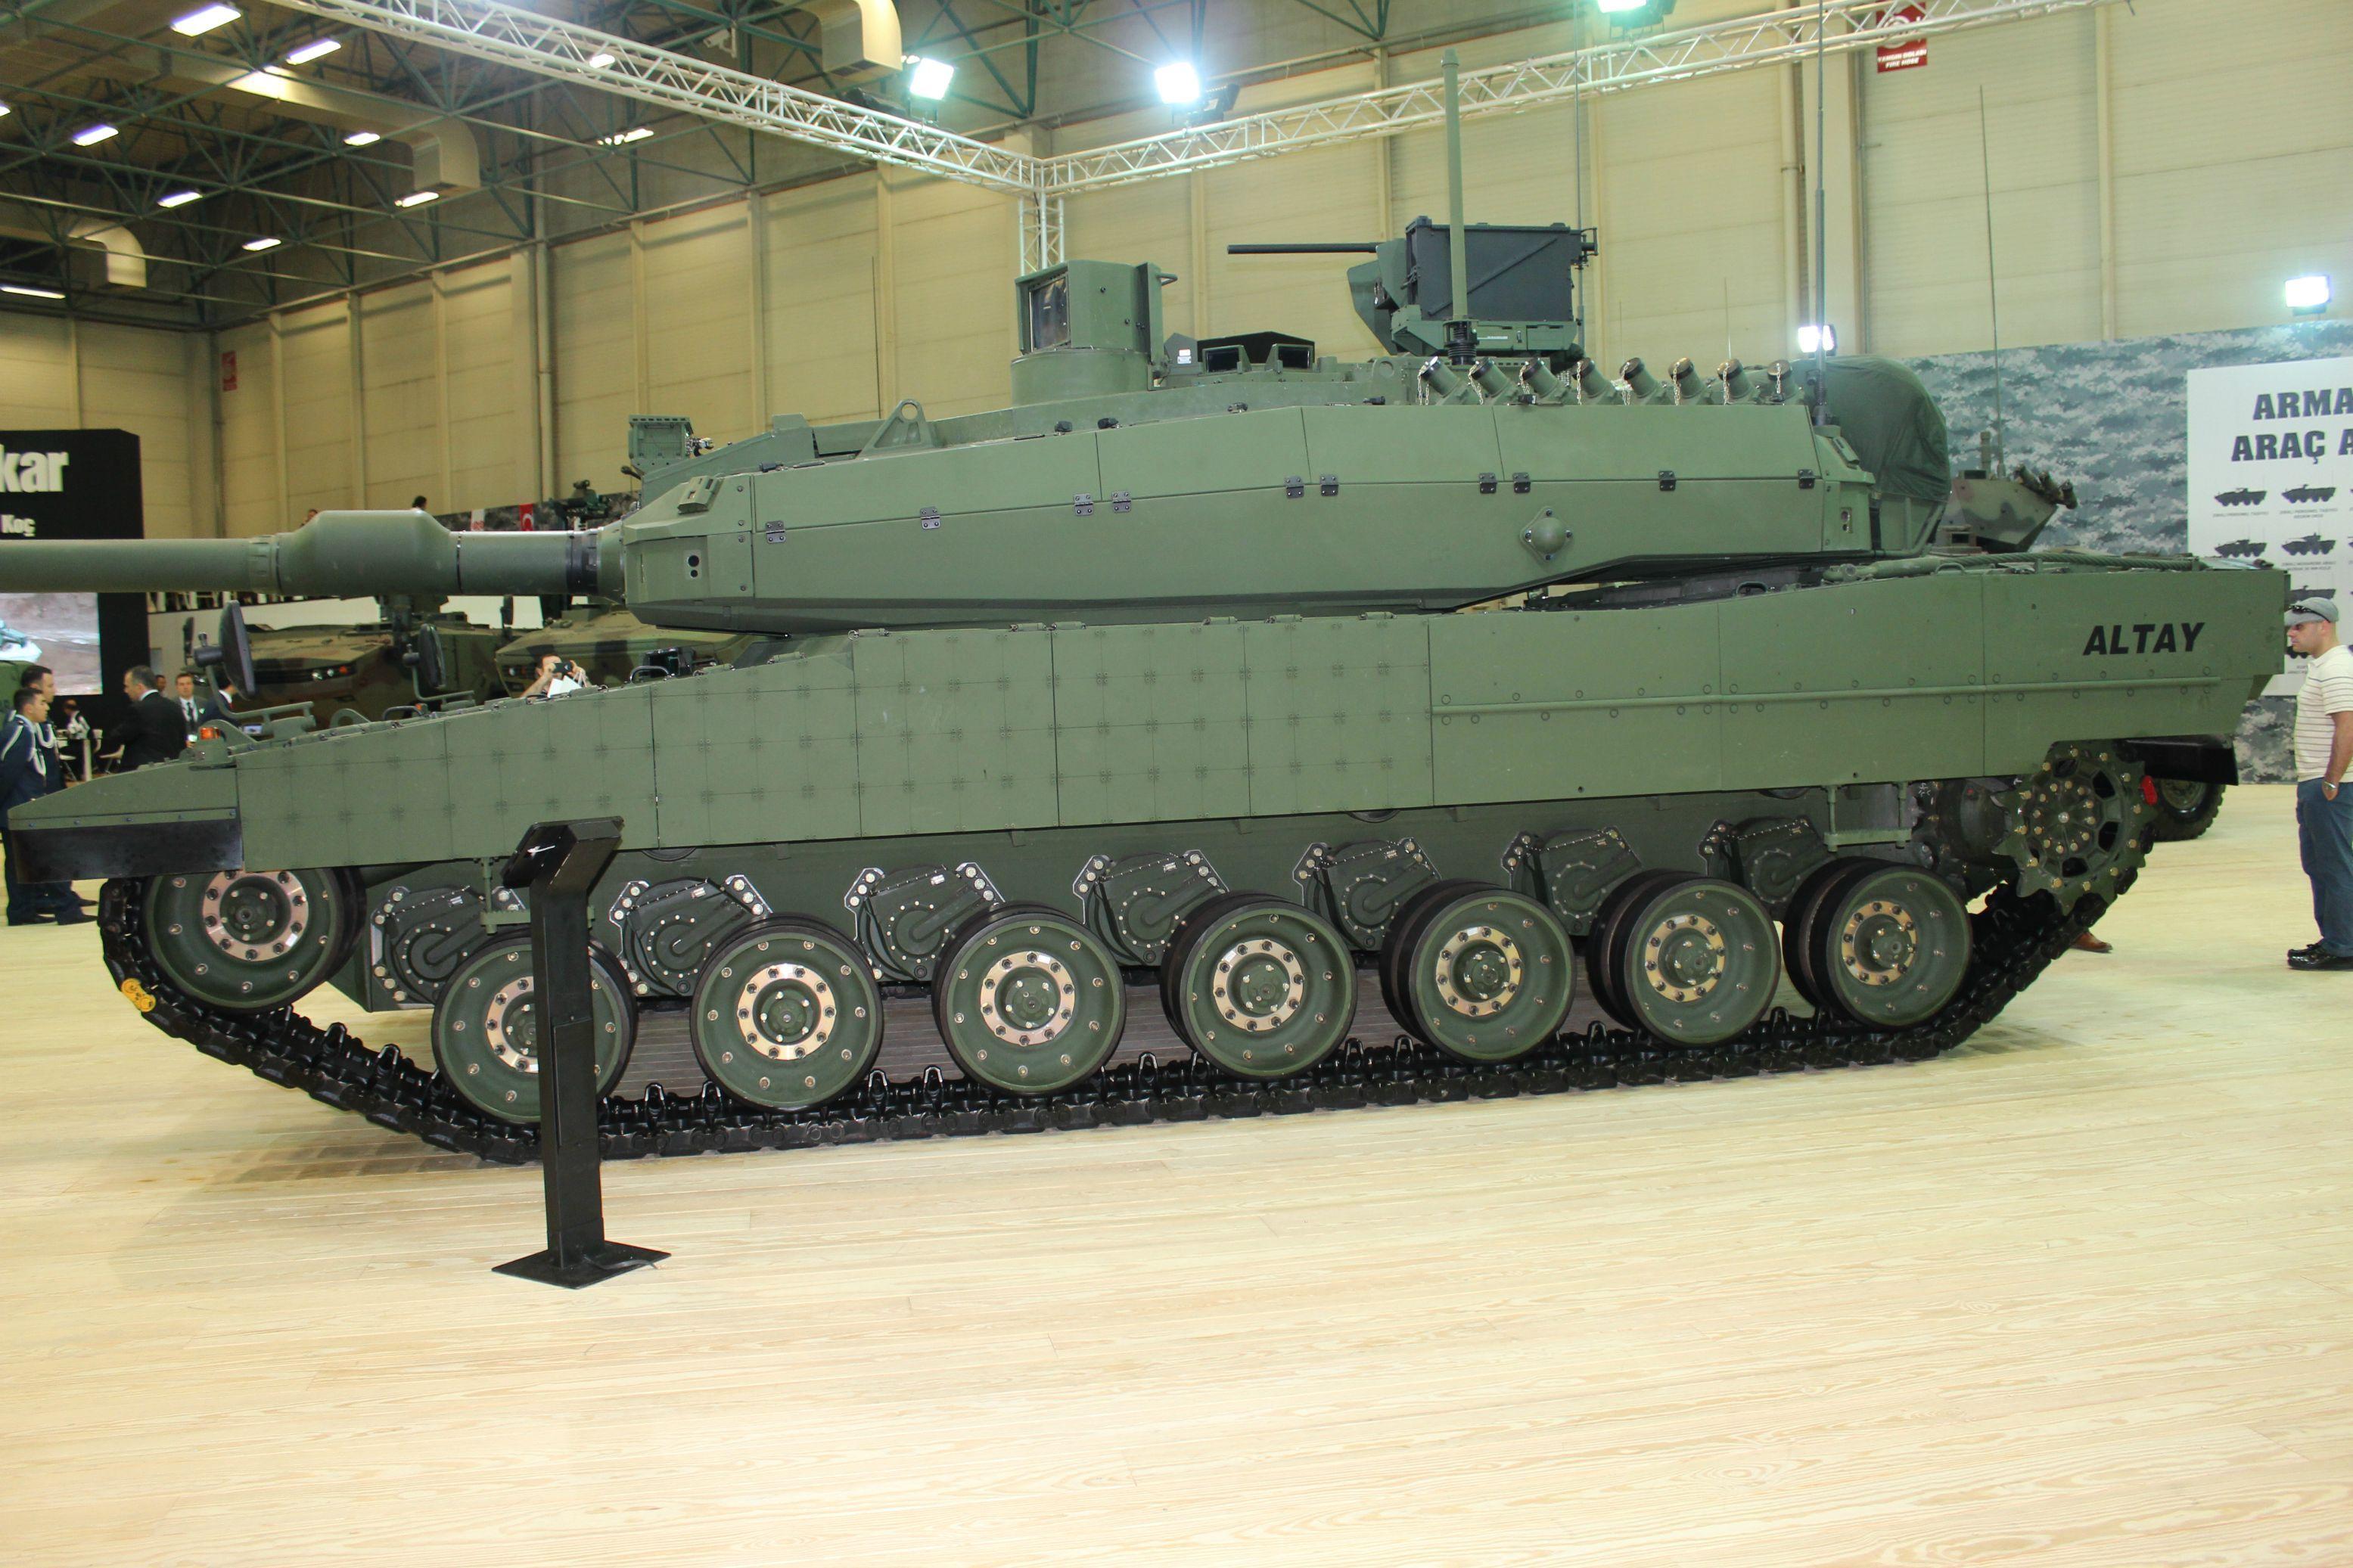 Altay Tank Turkiye Askeri Savas Ordu